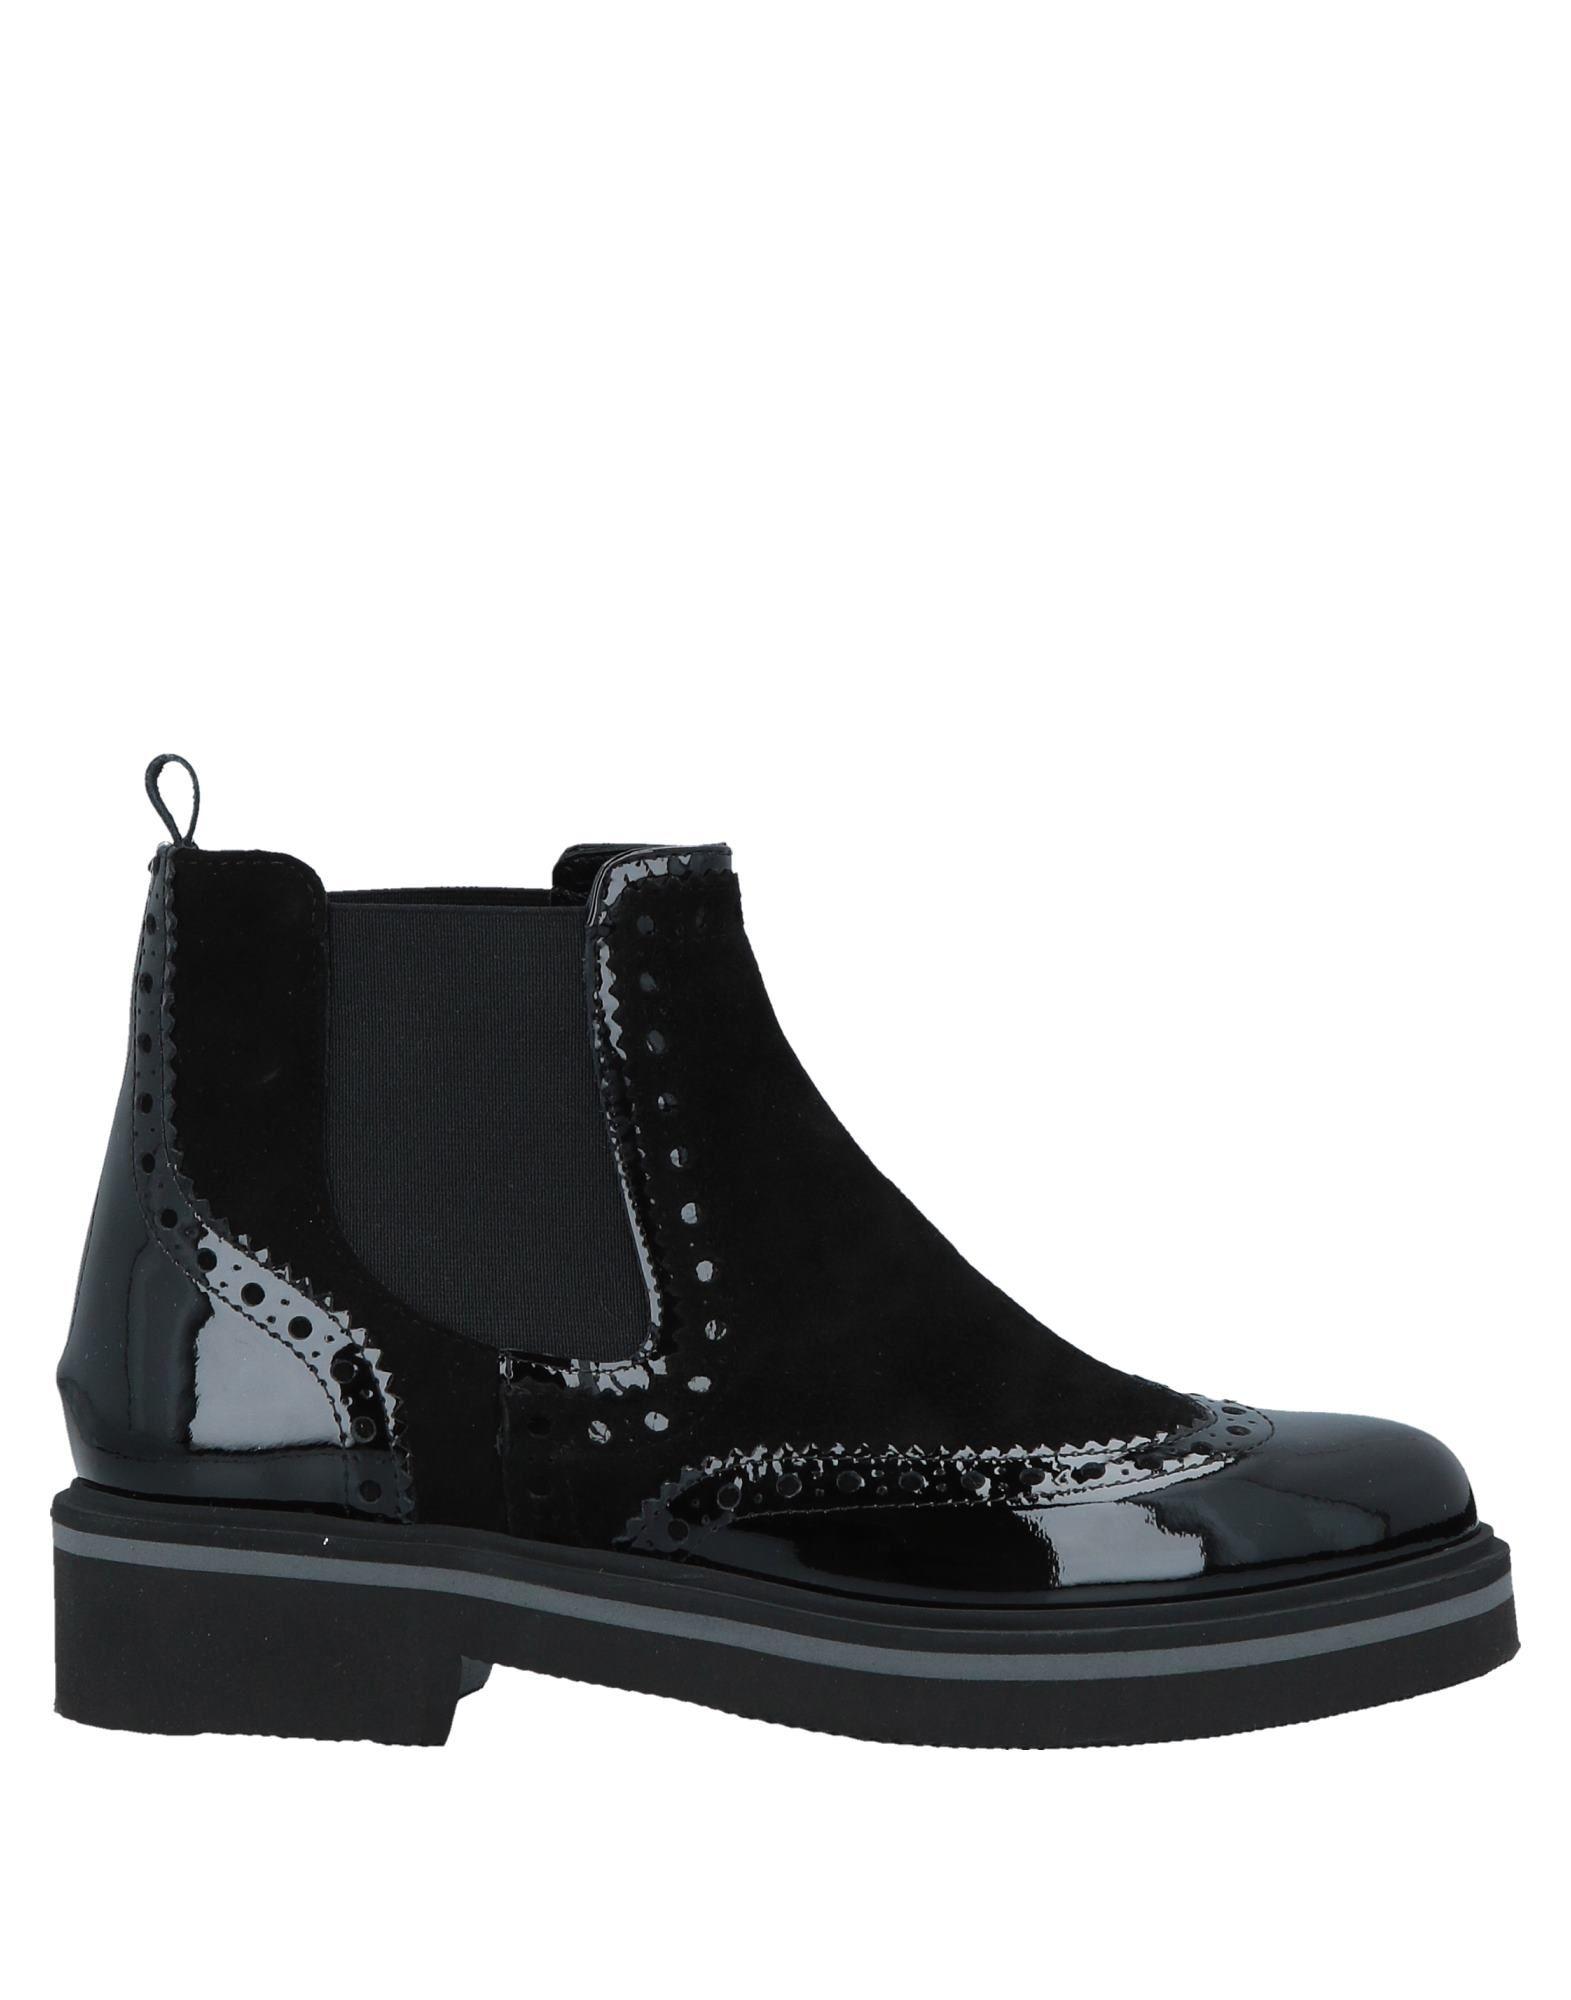 BALDININI TREND Полусапоги и высокие ботинки мокасины baldinini baldinini ba097awzyg29